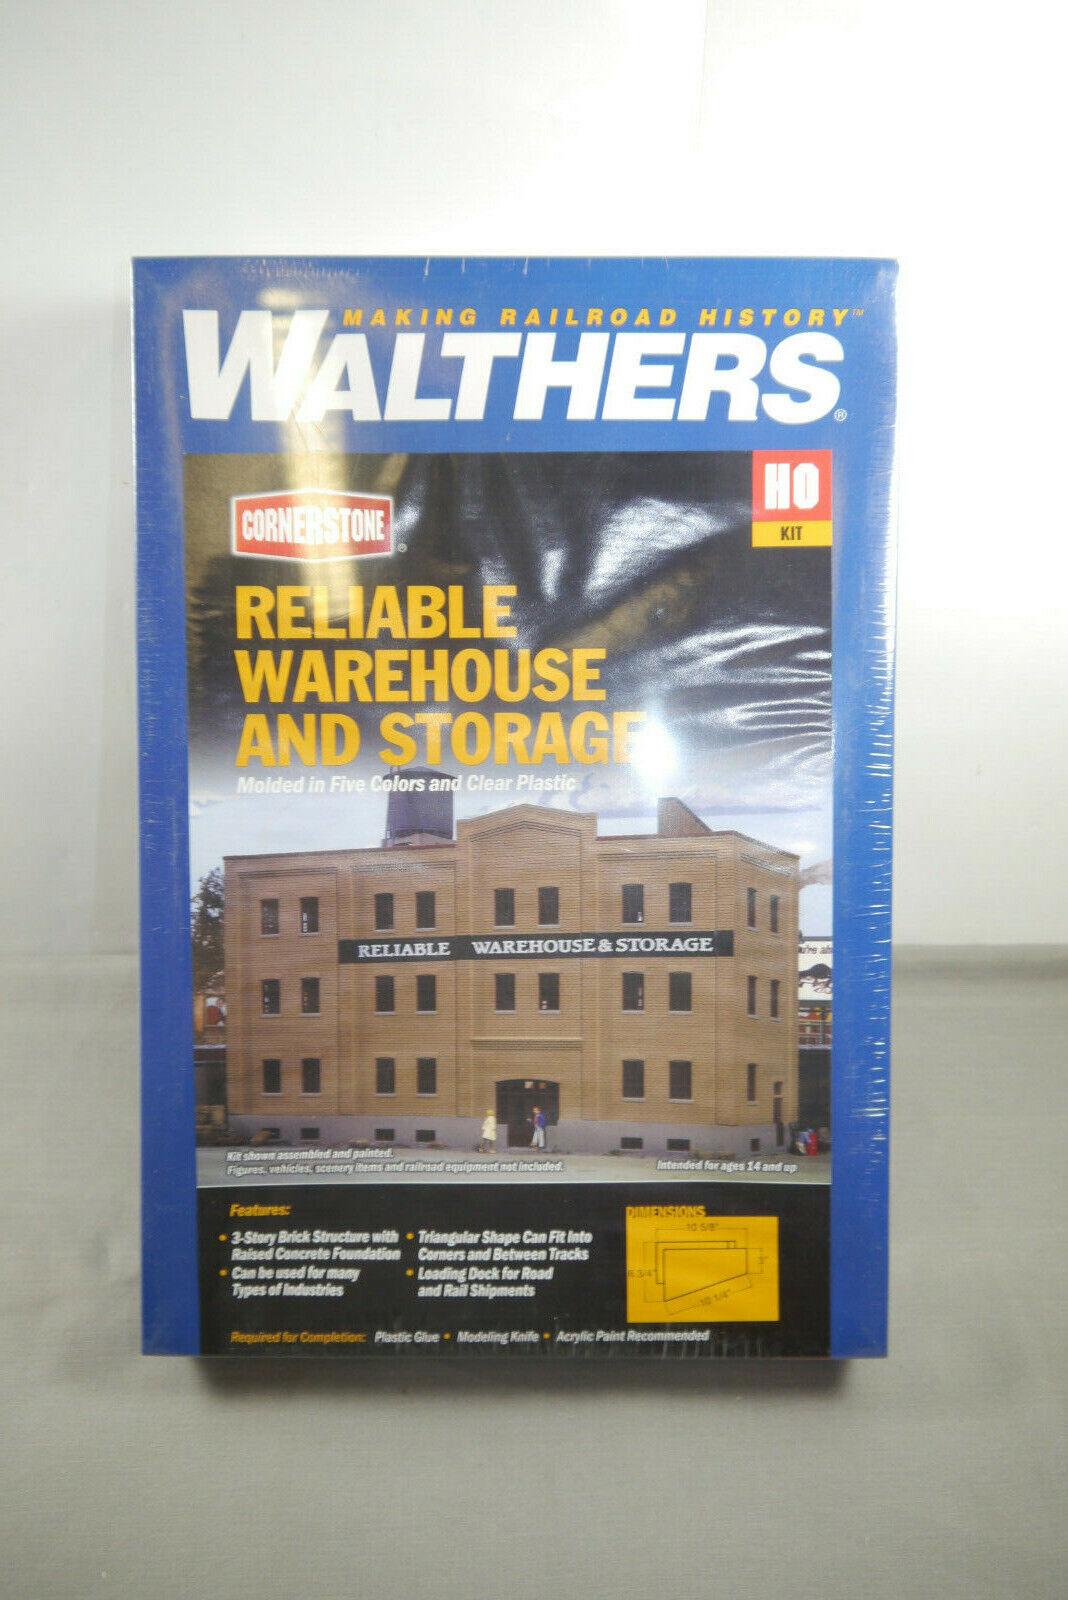 Walthers Cornerstone Reliable Warehaus and Storage  H0 Neu OVP (MF19)